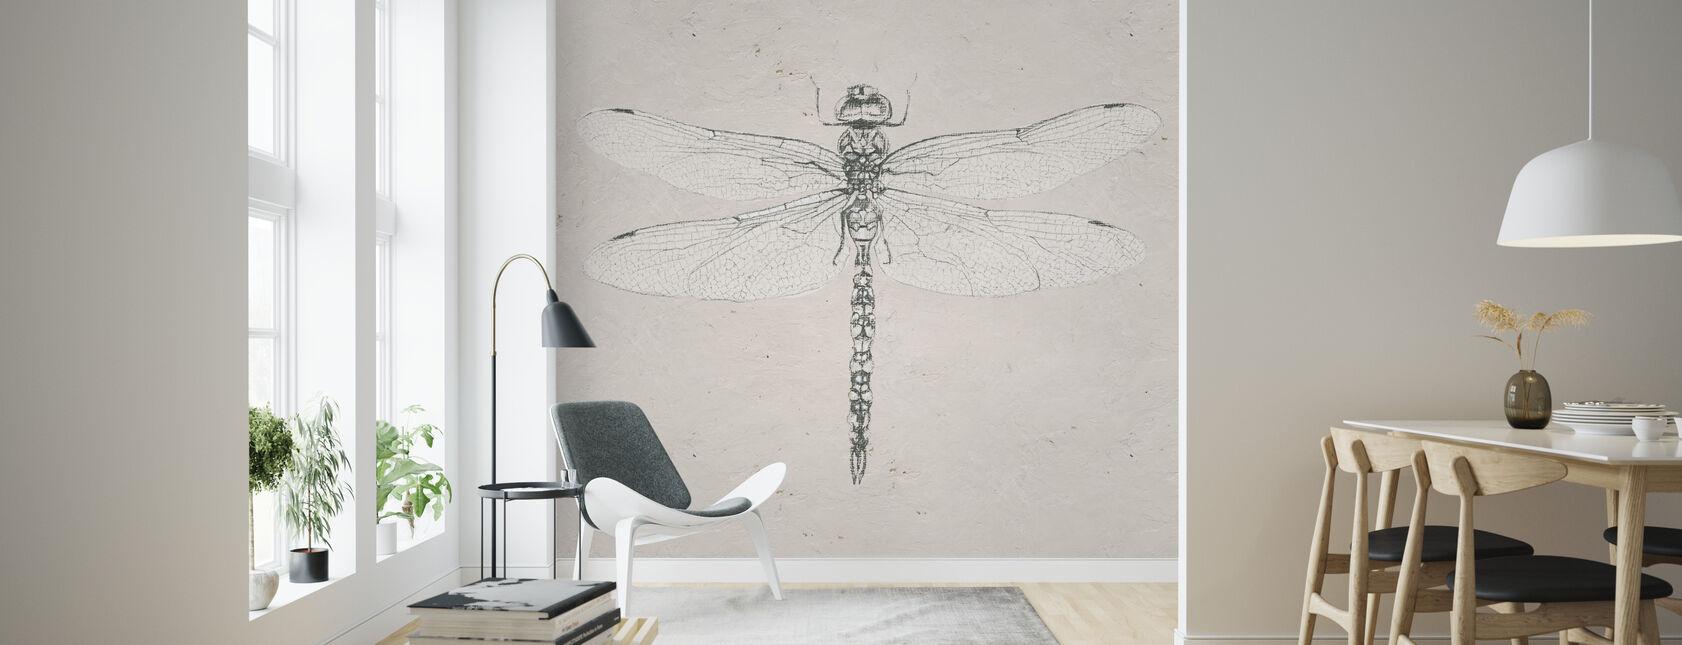 Soft Summer Sketches VI - Wallpaper - Living Room